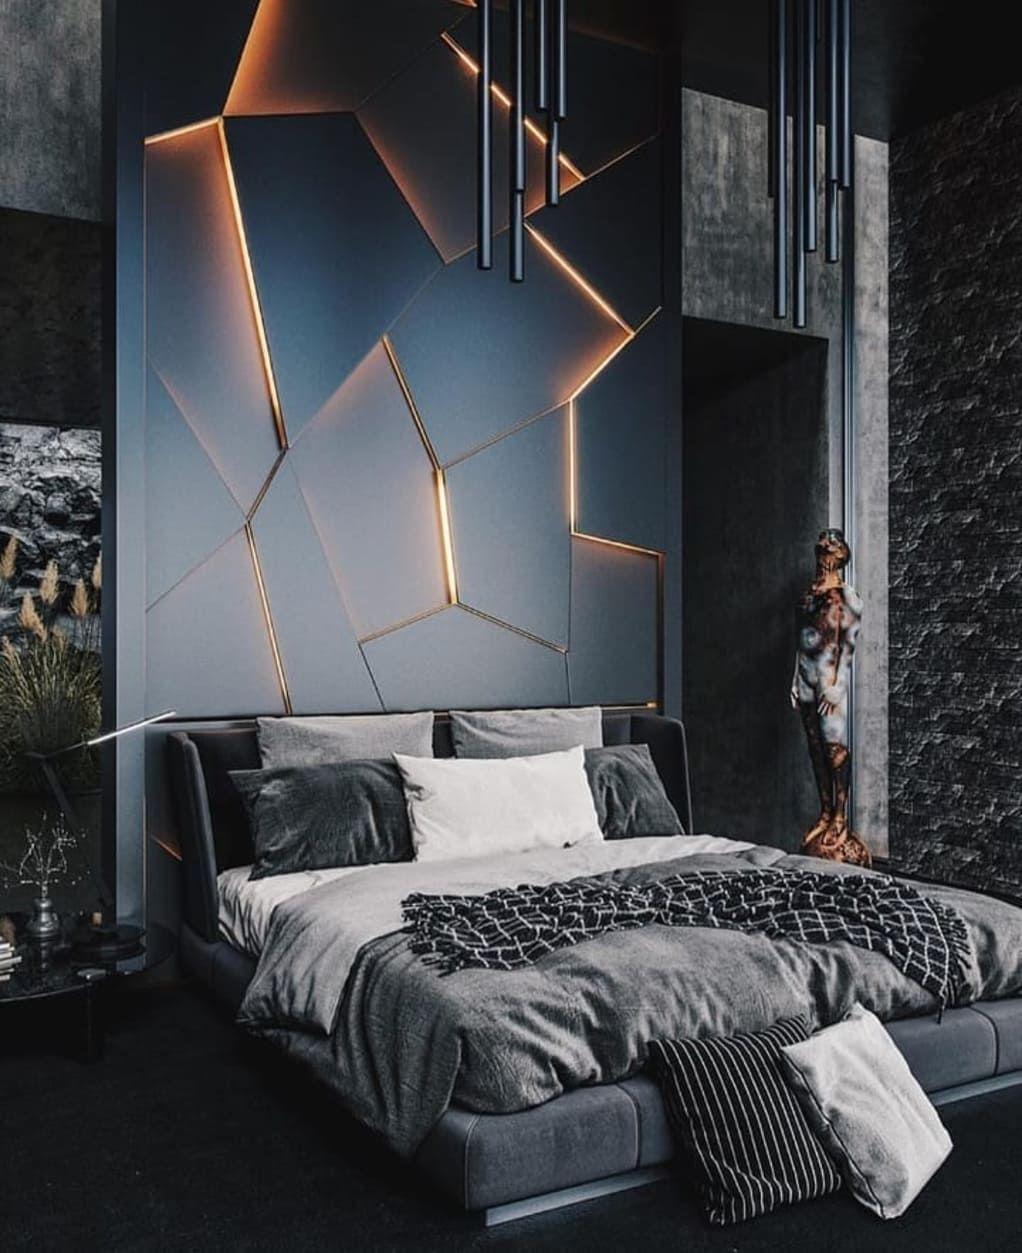 Minimal Interior Design Inspiration 182 Luxurious Bedrooms Luxury Bedroom Master Luxury Bedroom Design Bedroom interior design inspiration